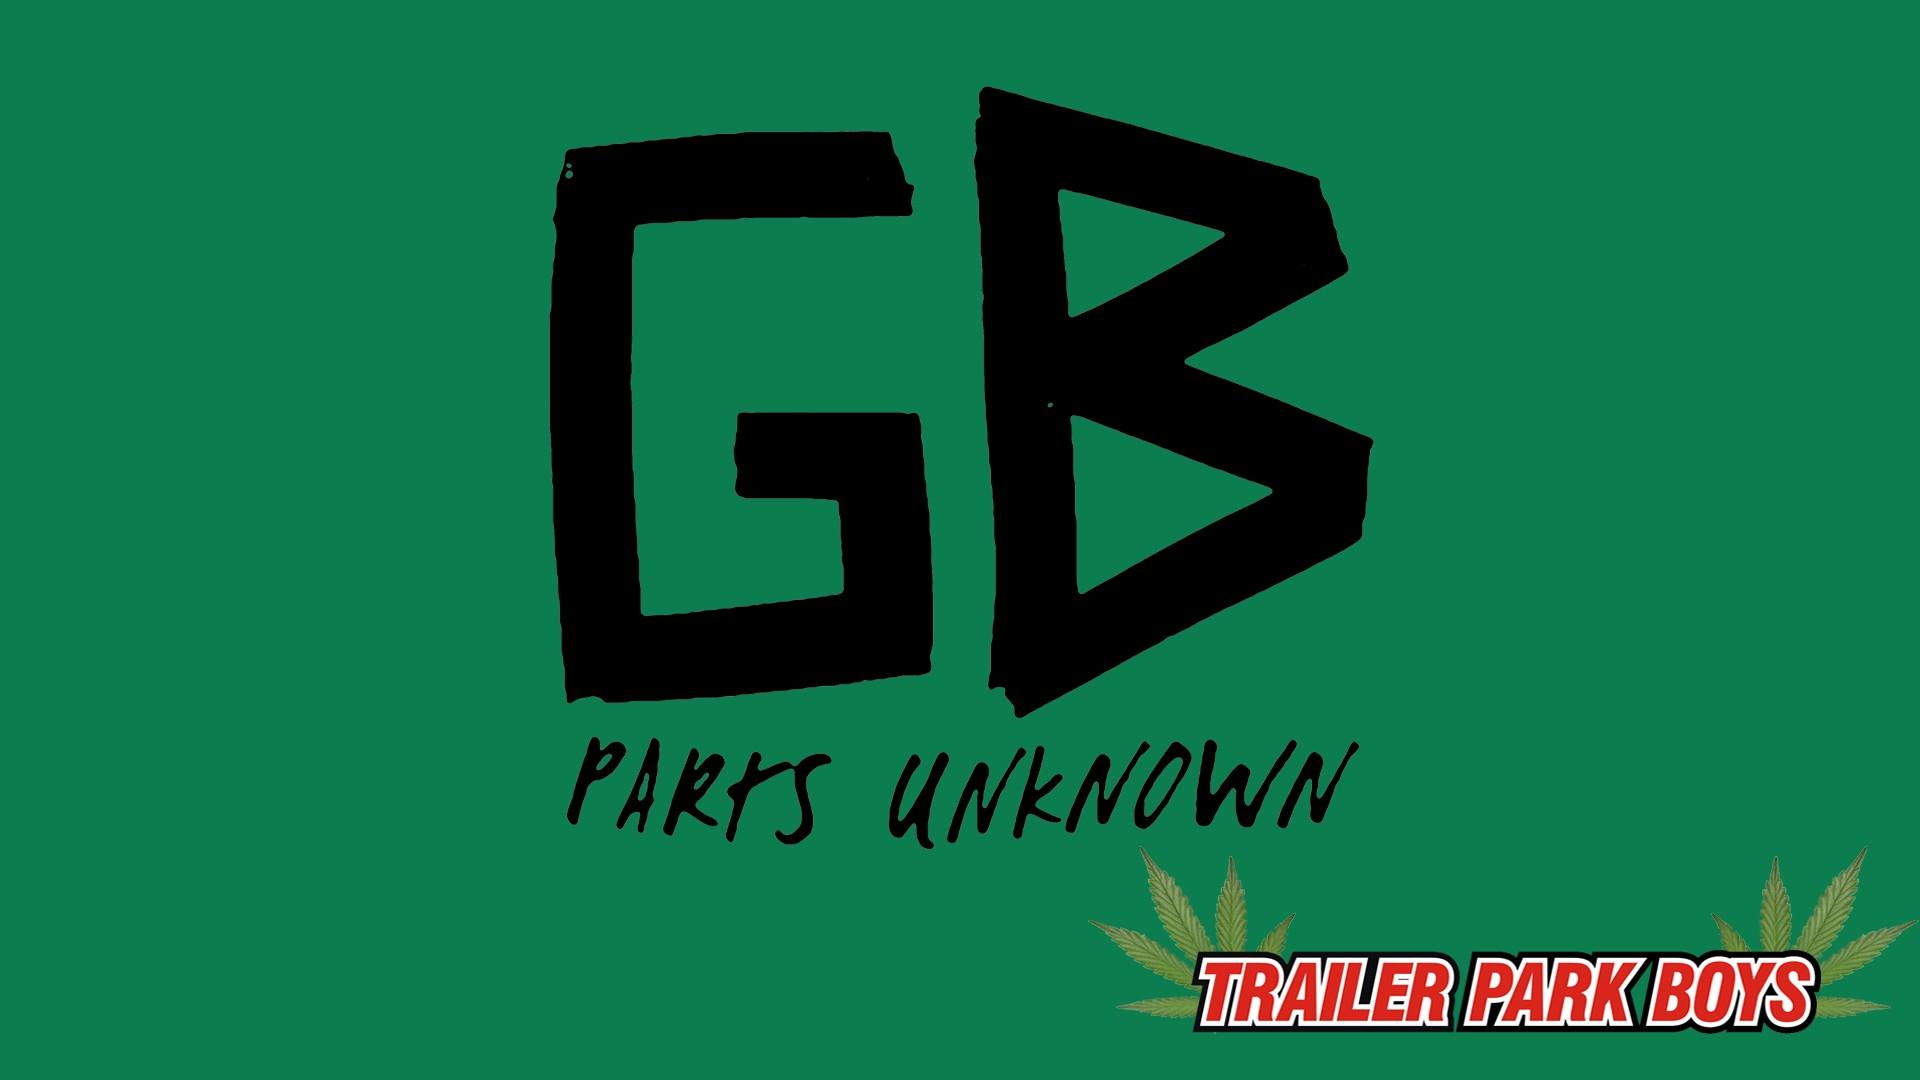 Wallpaper Illustration Text Logo Brand Trailer Park Boys